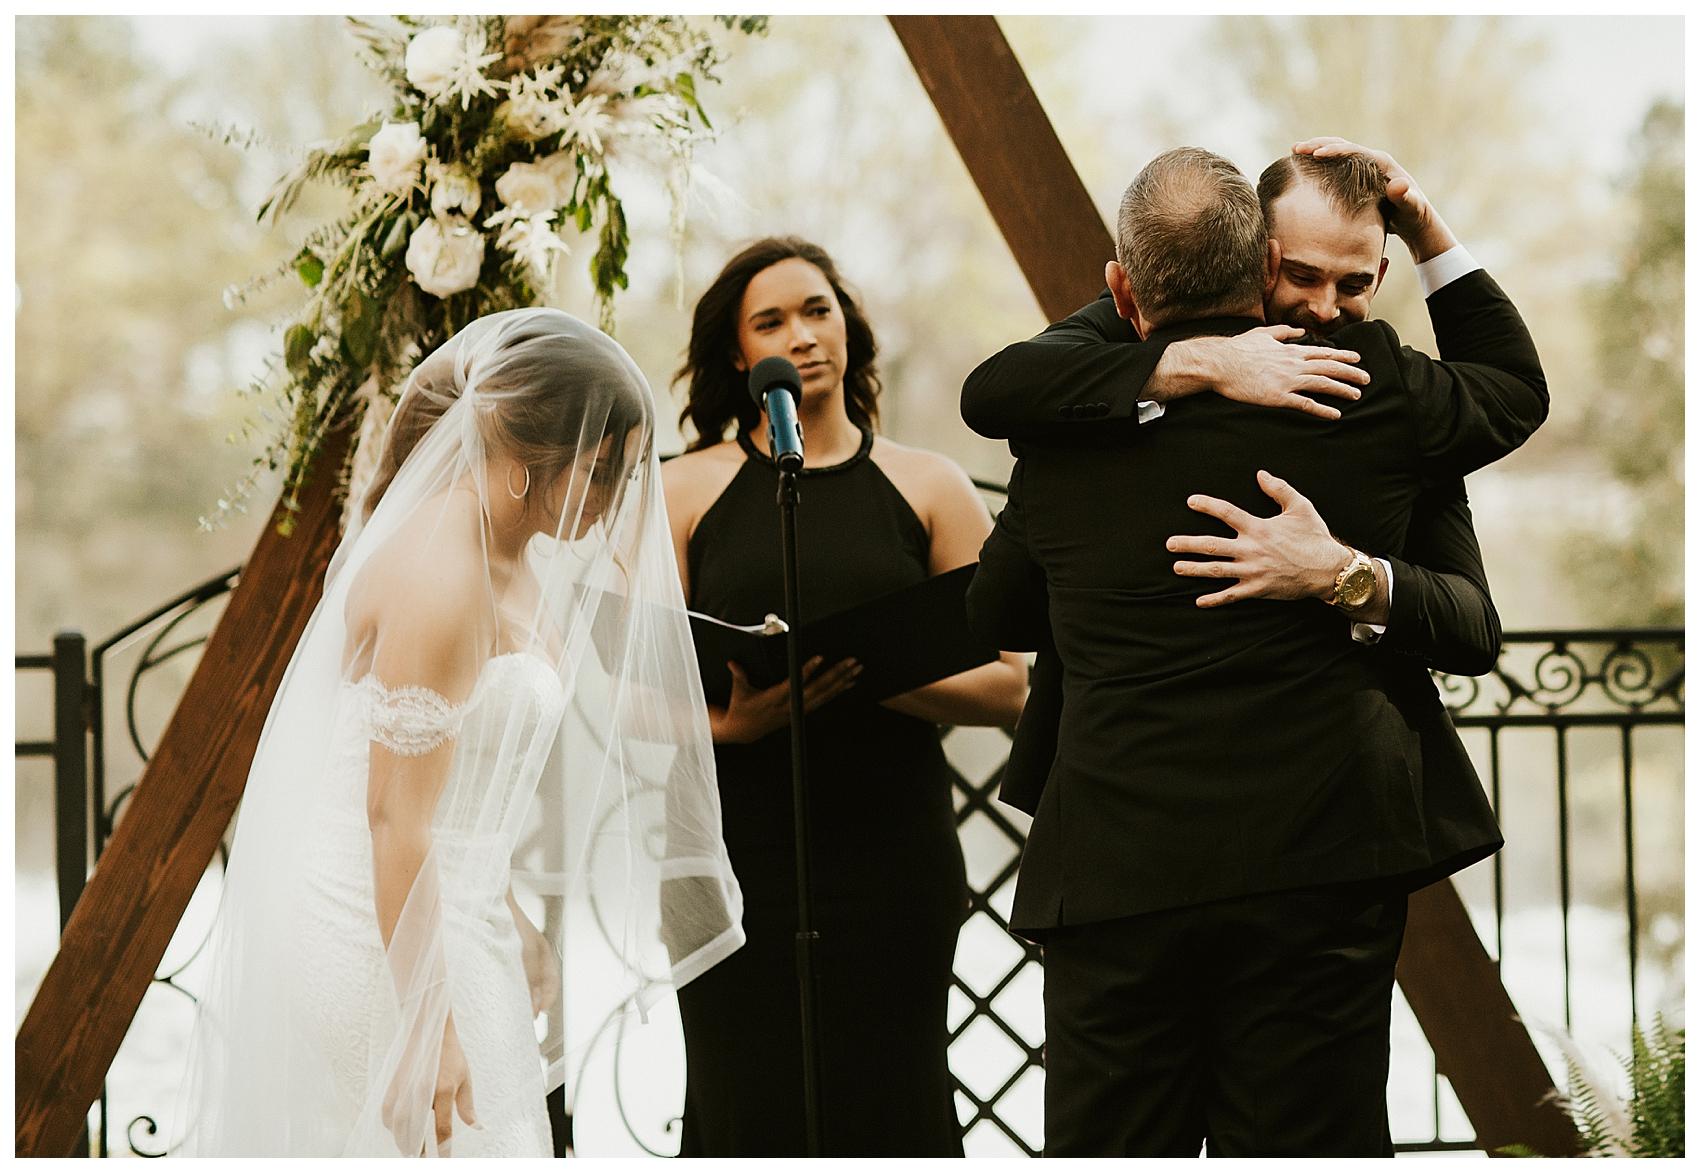 Chateau Rive Spokane Wedding Cassie Trottier Photography01052.jpg